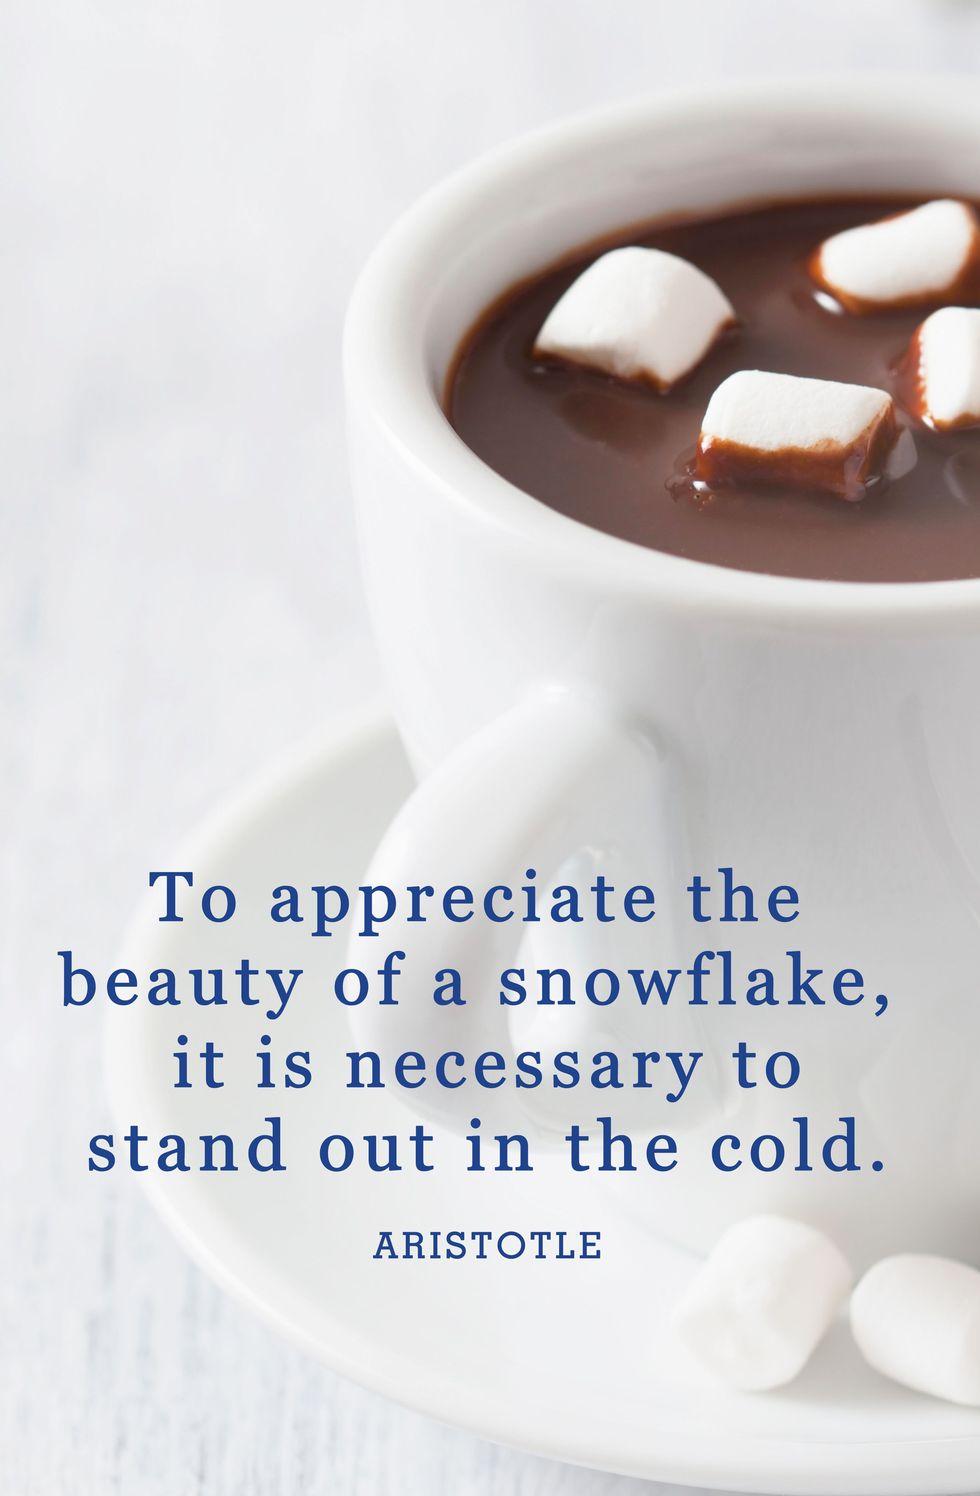 winter-snow-quotes-aristotle-1543337981